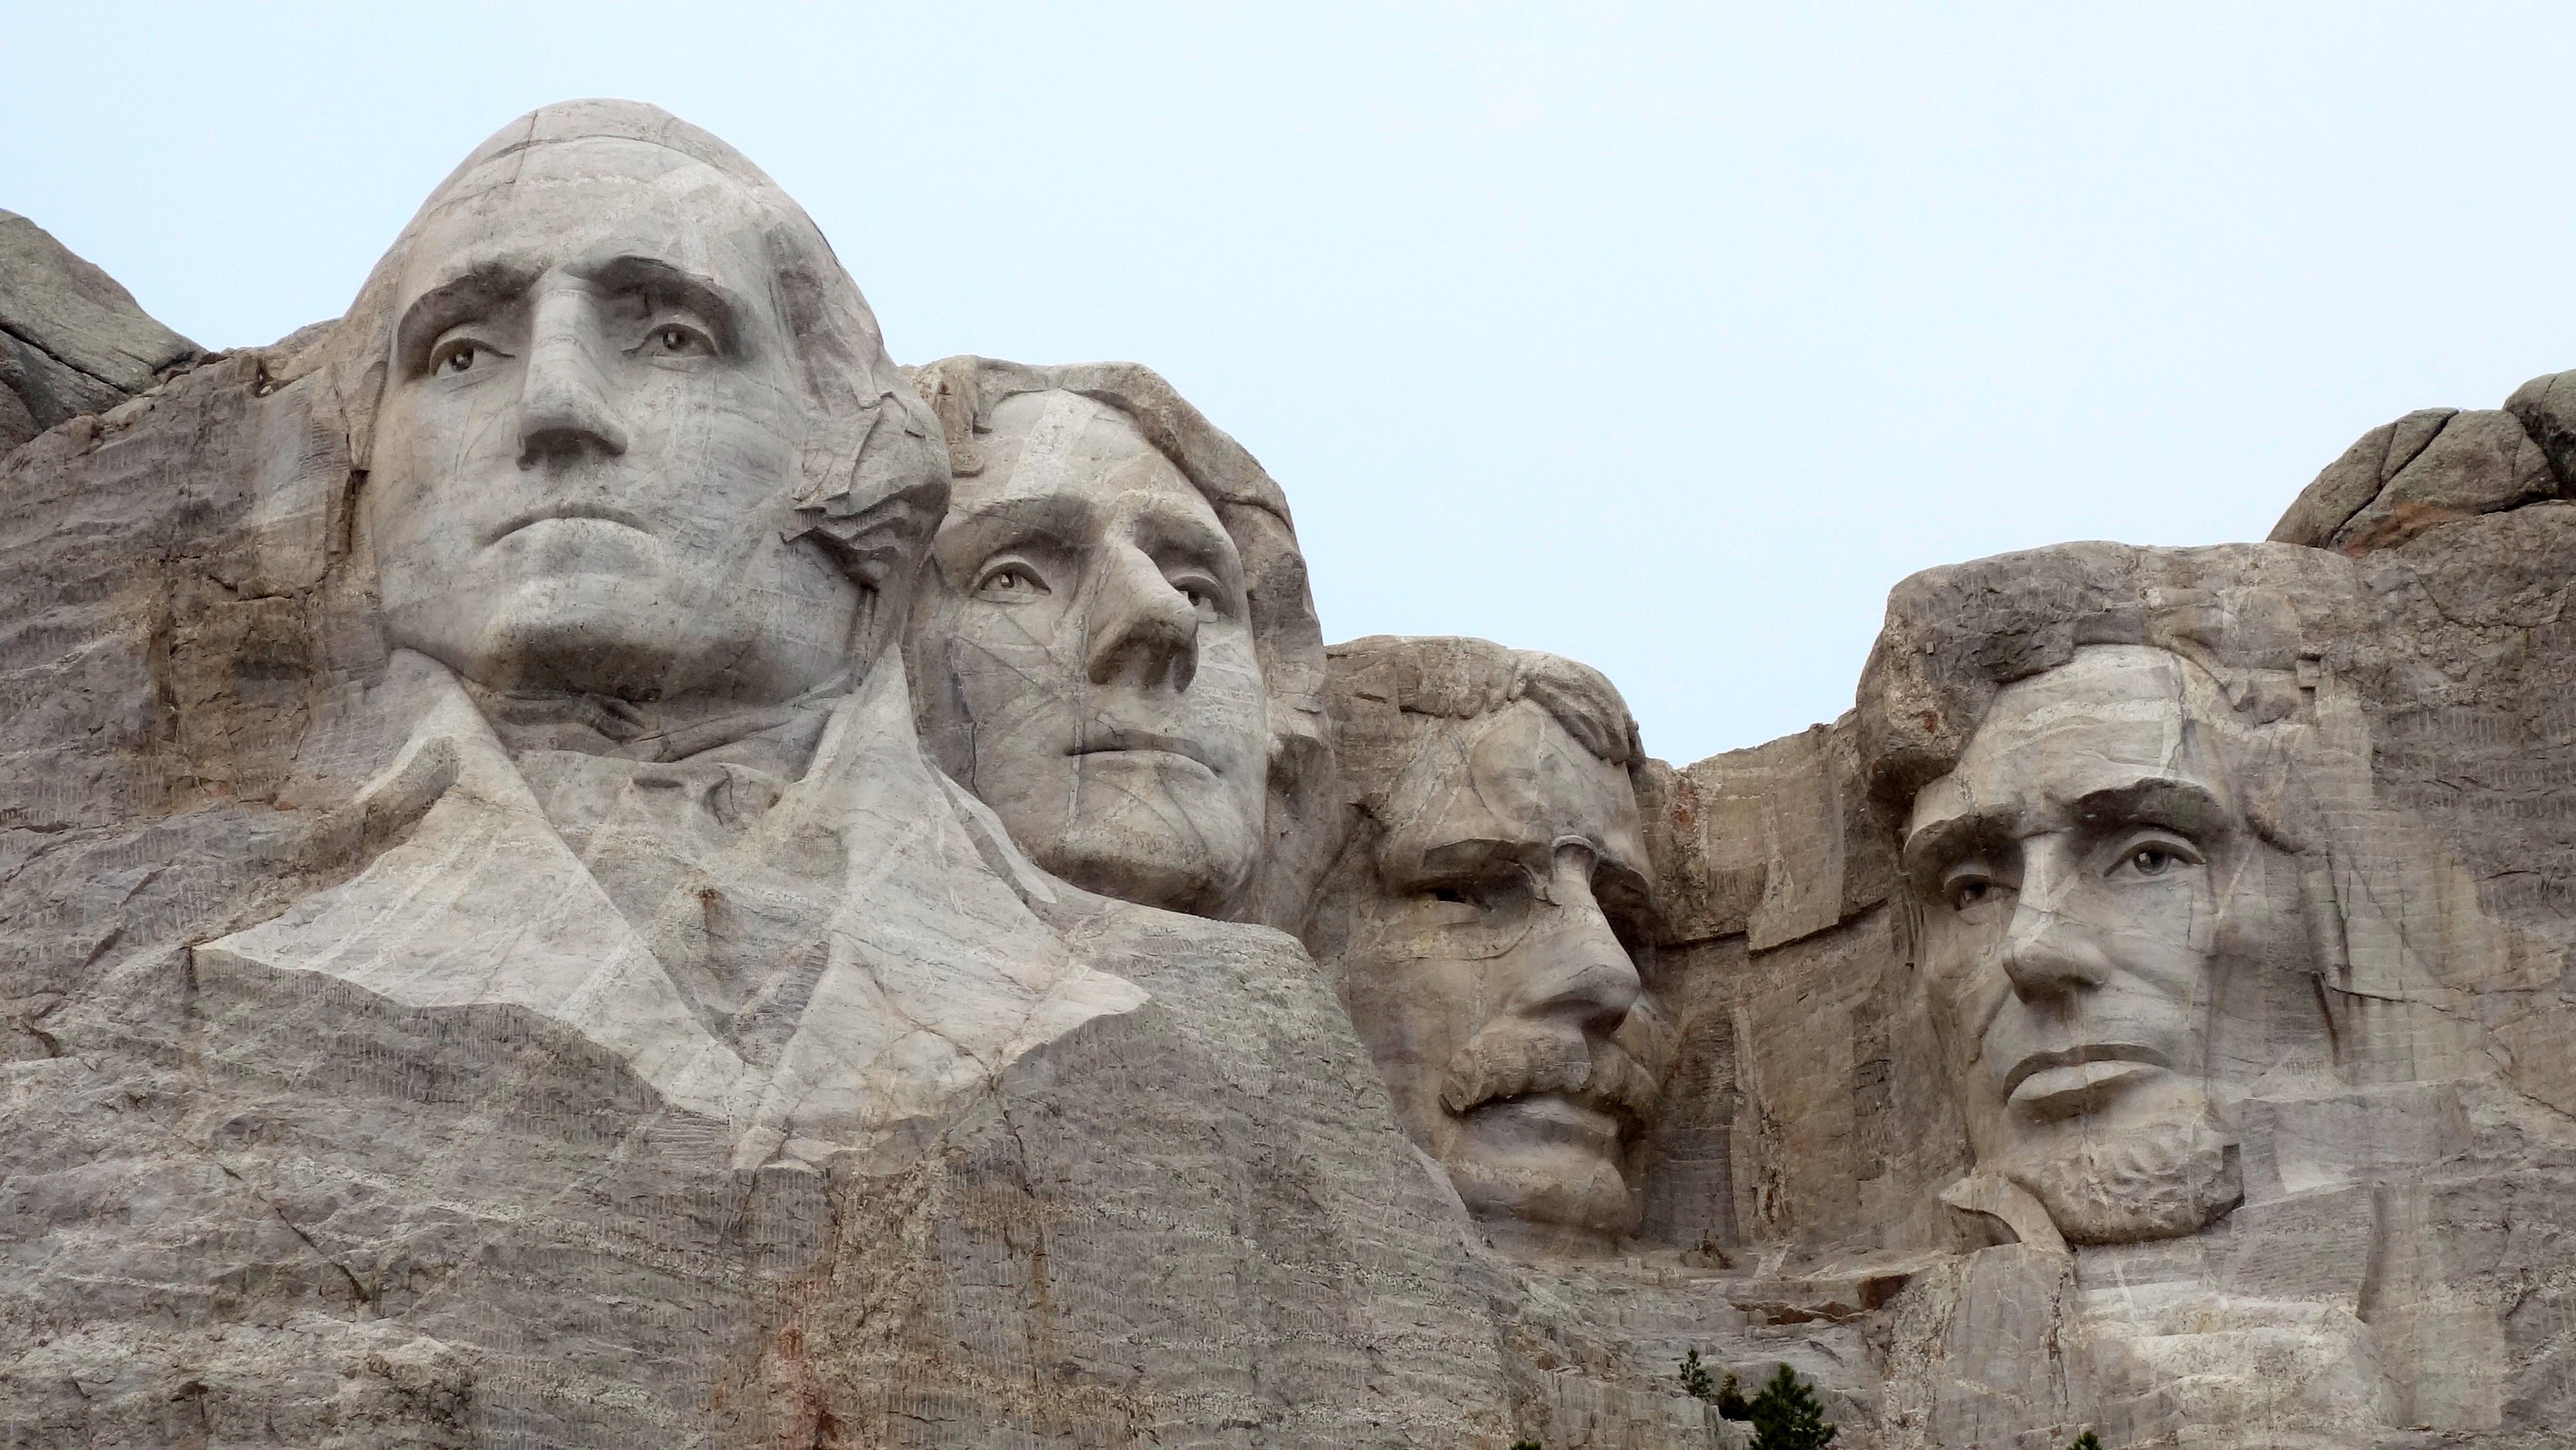 Fotos gratis : arena, rock, Monumento, estatua, America, Monte ...